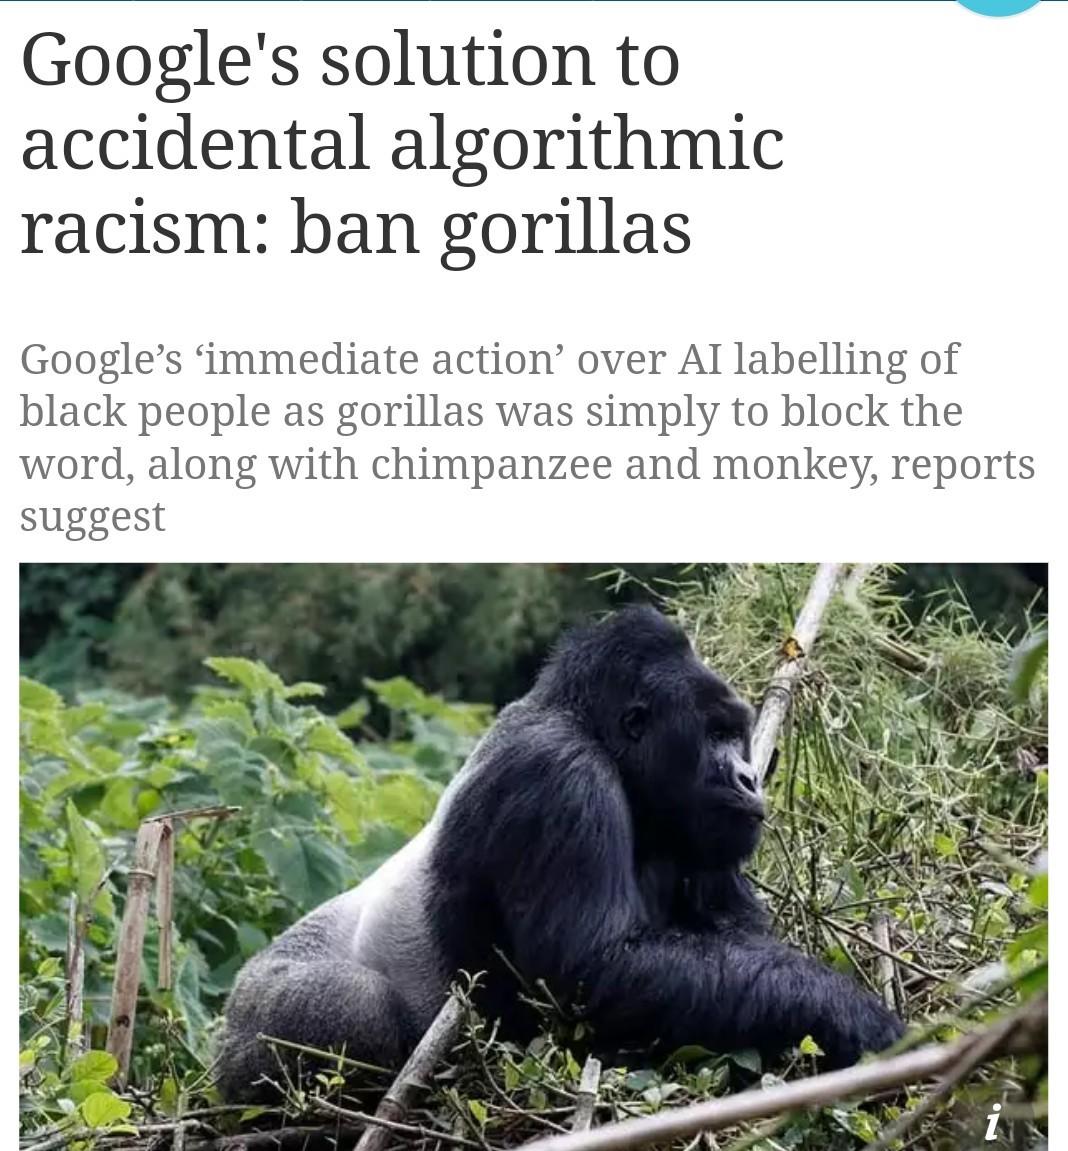 No offense to gorillas though - meme